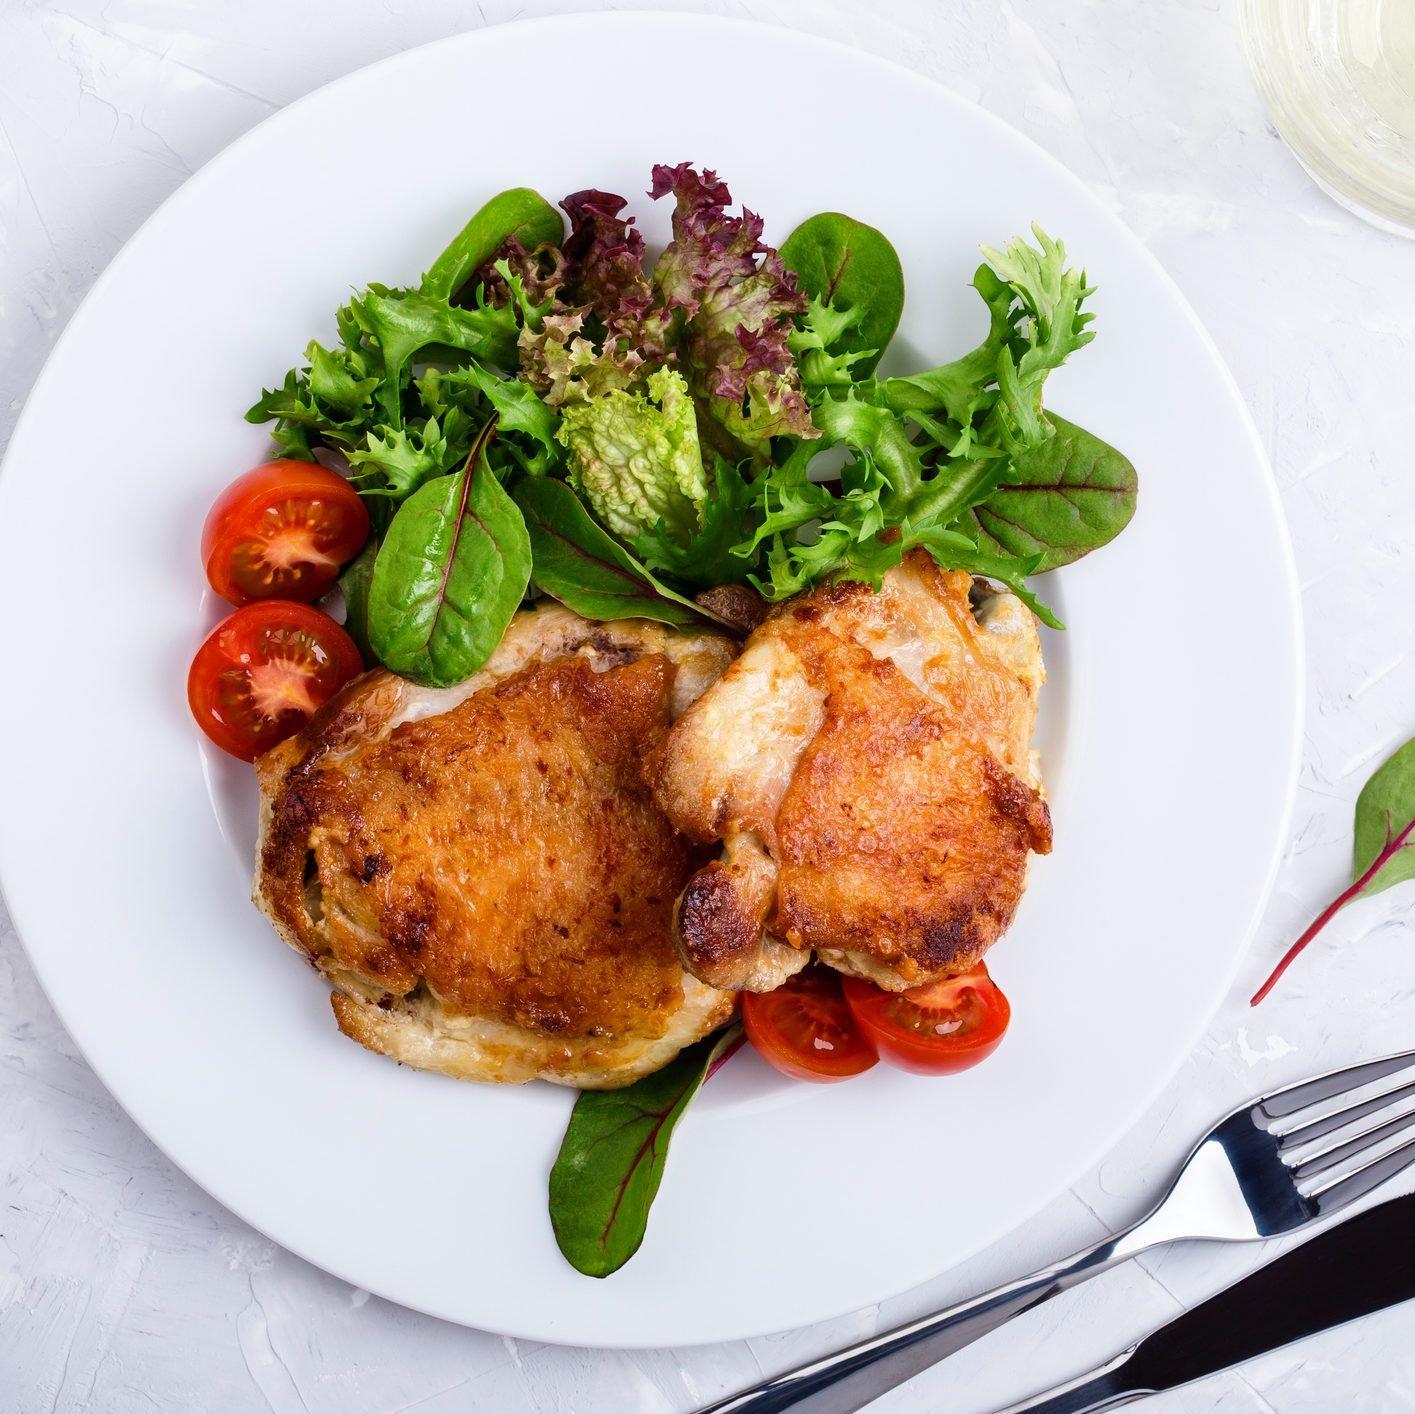 Roast chicken legs on white plate over light gray plaster texture table